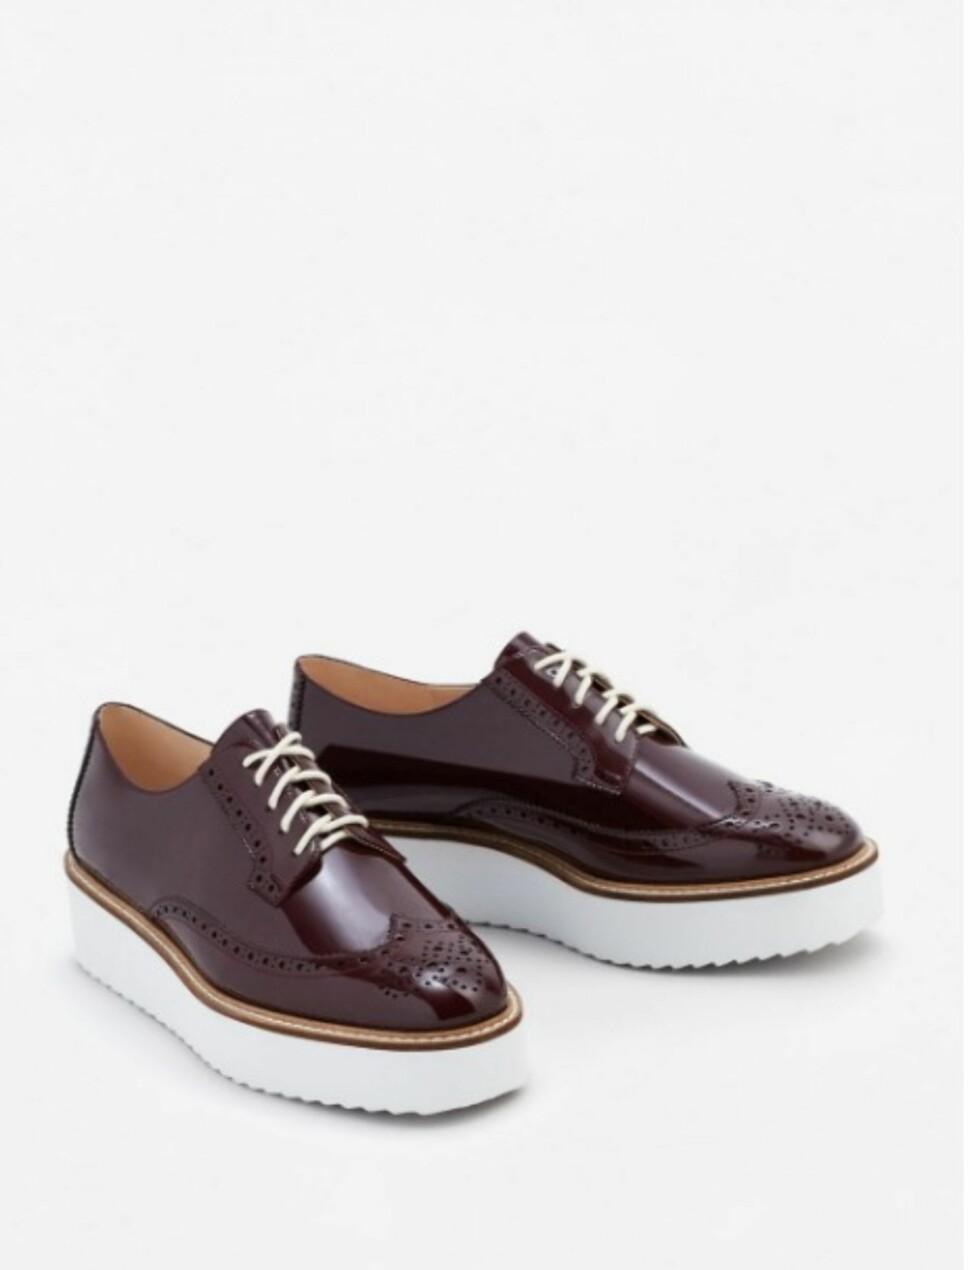 <strong>Sko fra Mango   kr 349   http:</strong>//shop.mango.com/NO-en/p1/woman/accessories/shoes/flat-shoes/patent-effect-platform-blucher?id=83090162_78&n=1&s=mss_she&ts=1490176175387